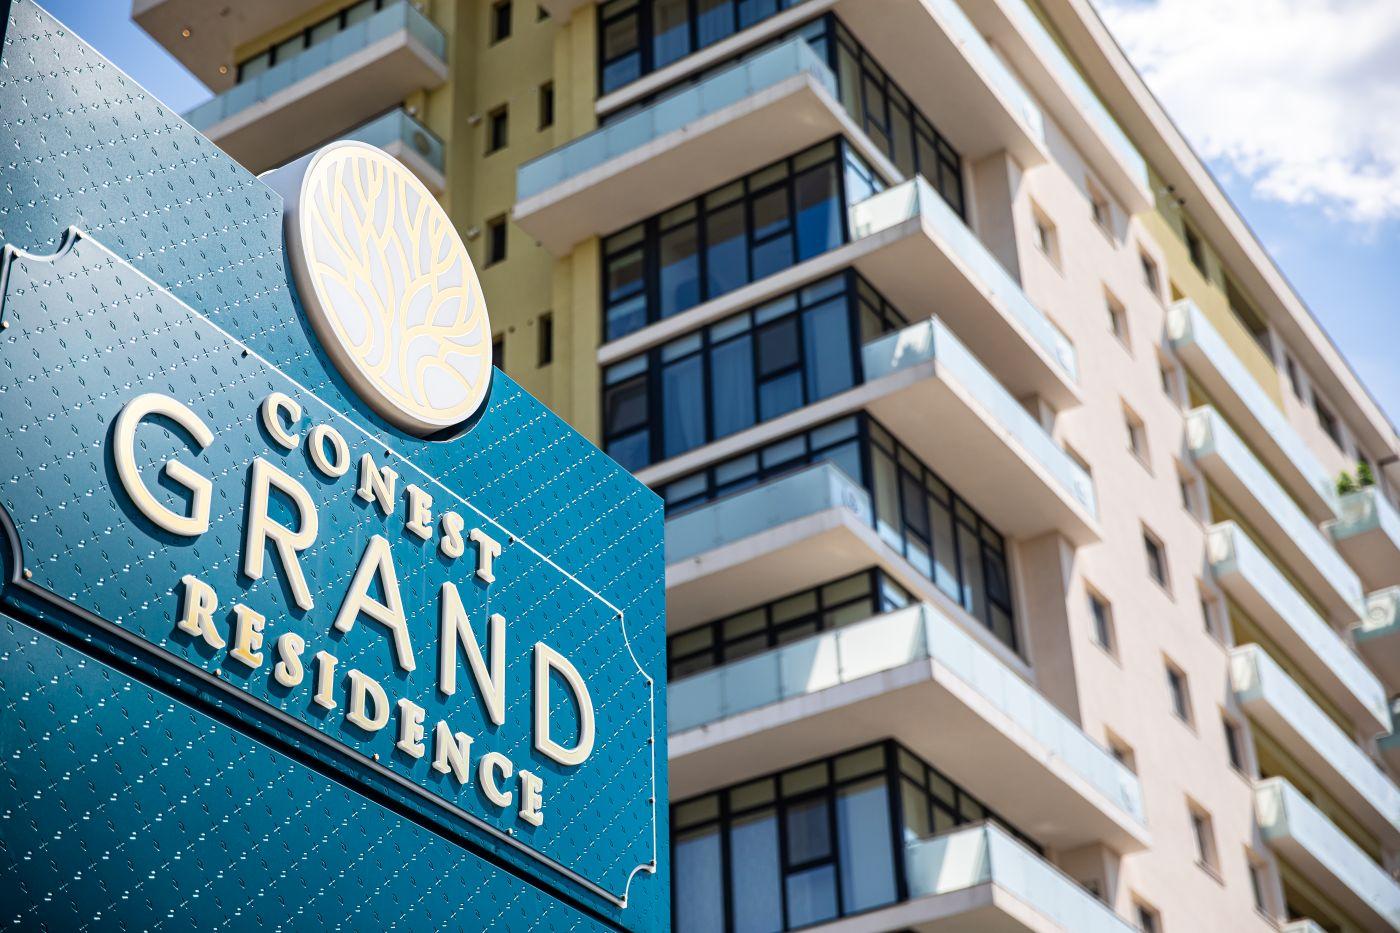 conest-grand-residence-spatii-comerciale-de-inchiriat-iasi-cgr-14